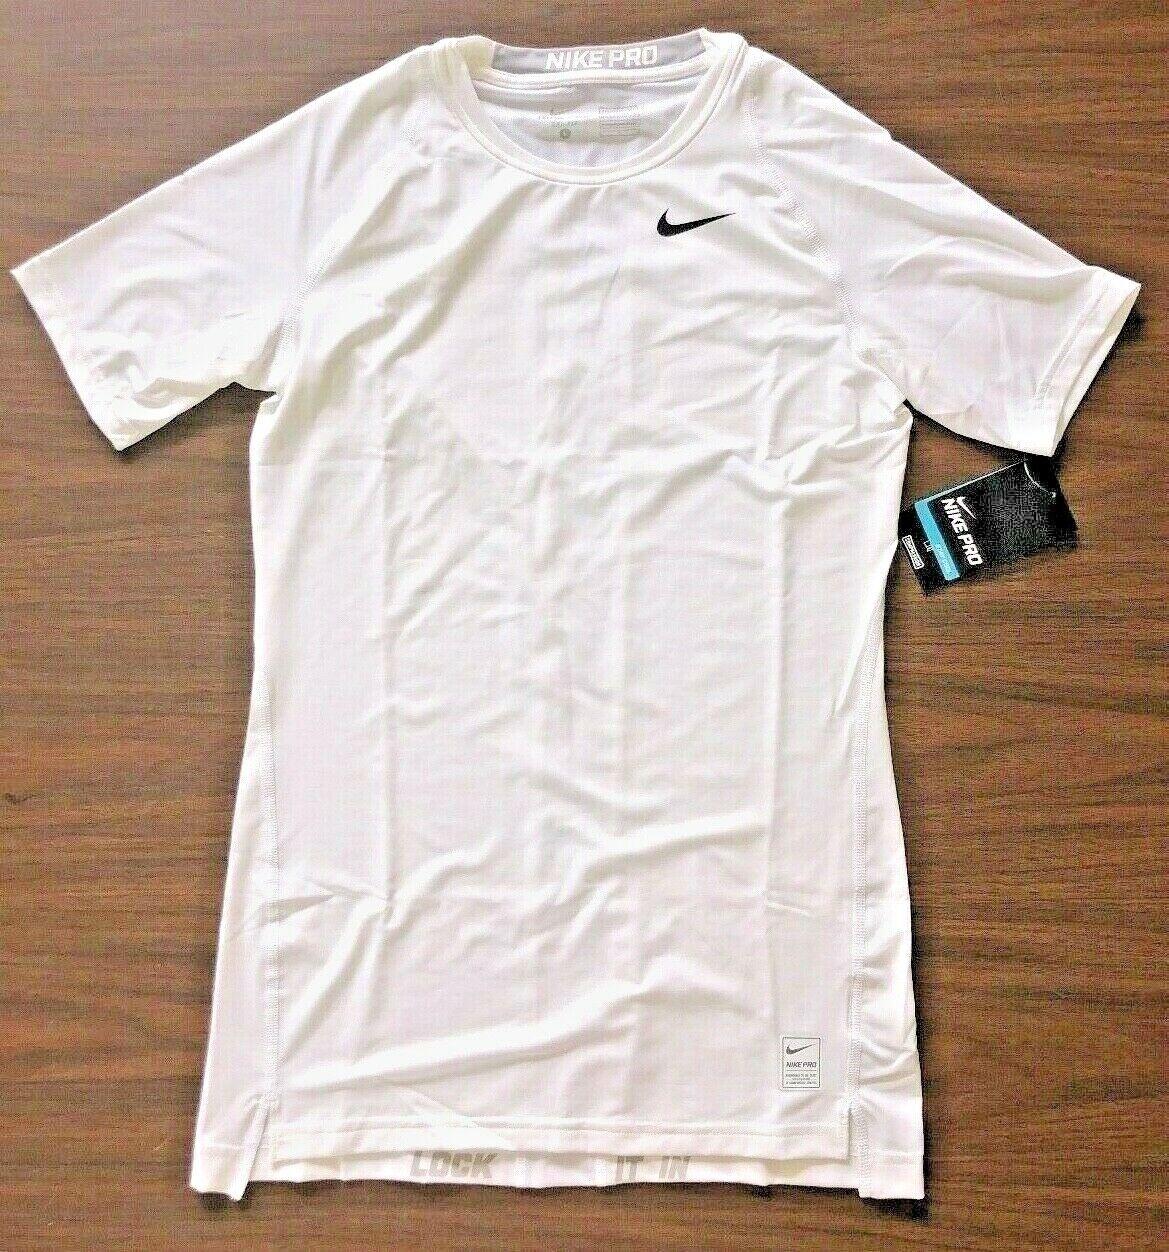 NIKE Men's Dri-FIT COMPRESSION Training Tee Shirt White NEW